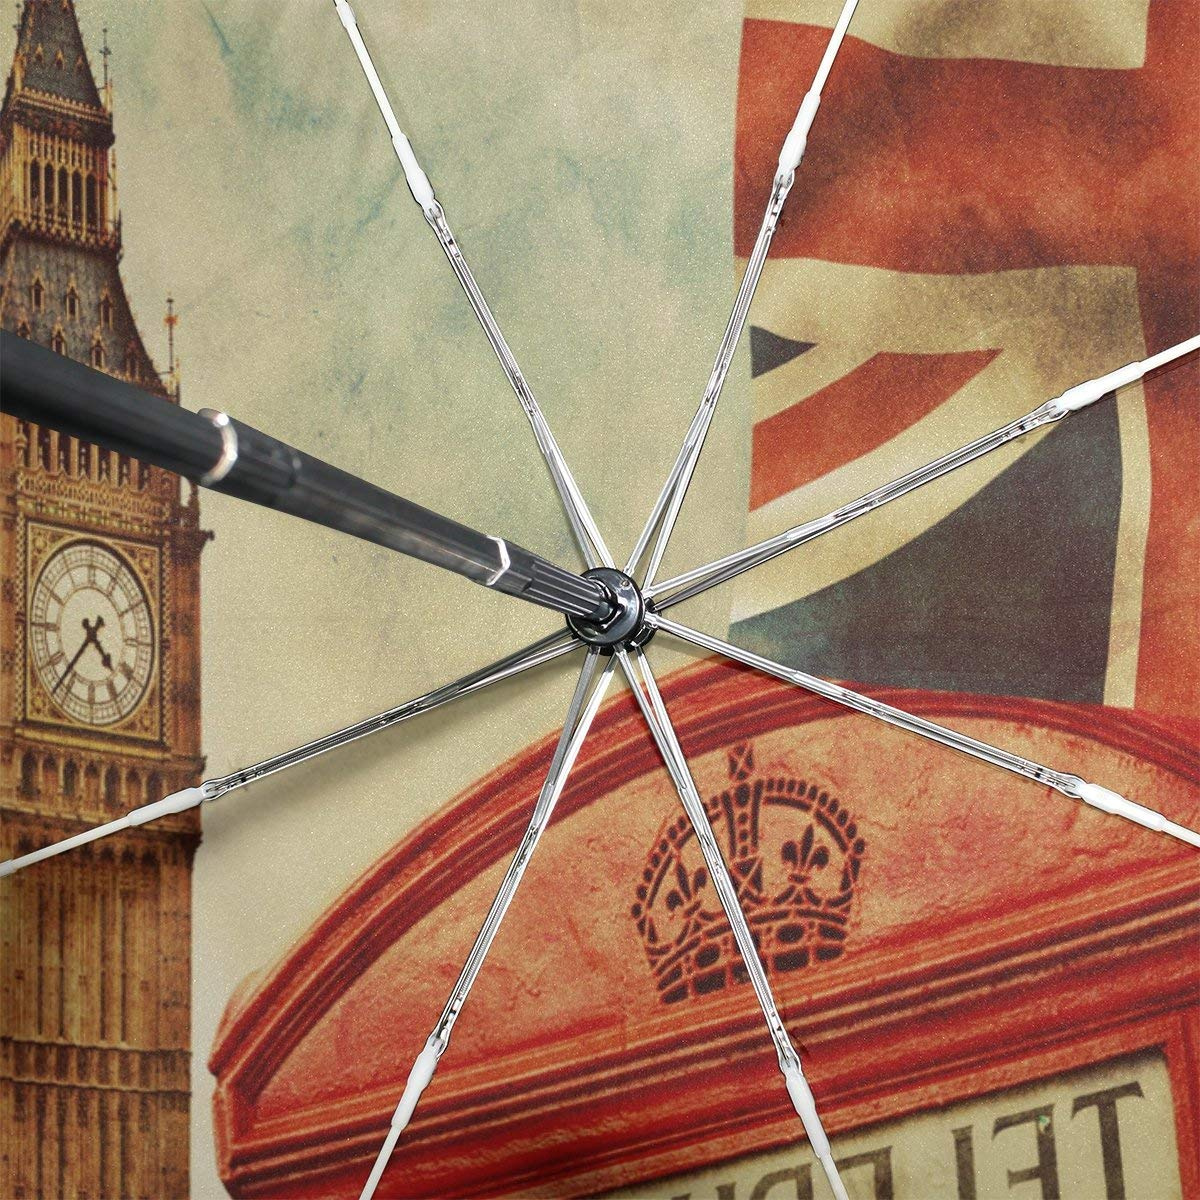 f4cfbfba4e29 WOZO Vintage Union Jack Big Ben 3 Folds Auto Open Close Umbrella